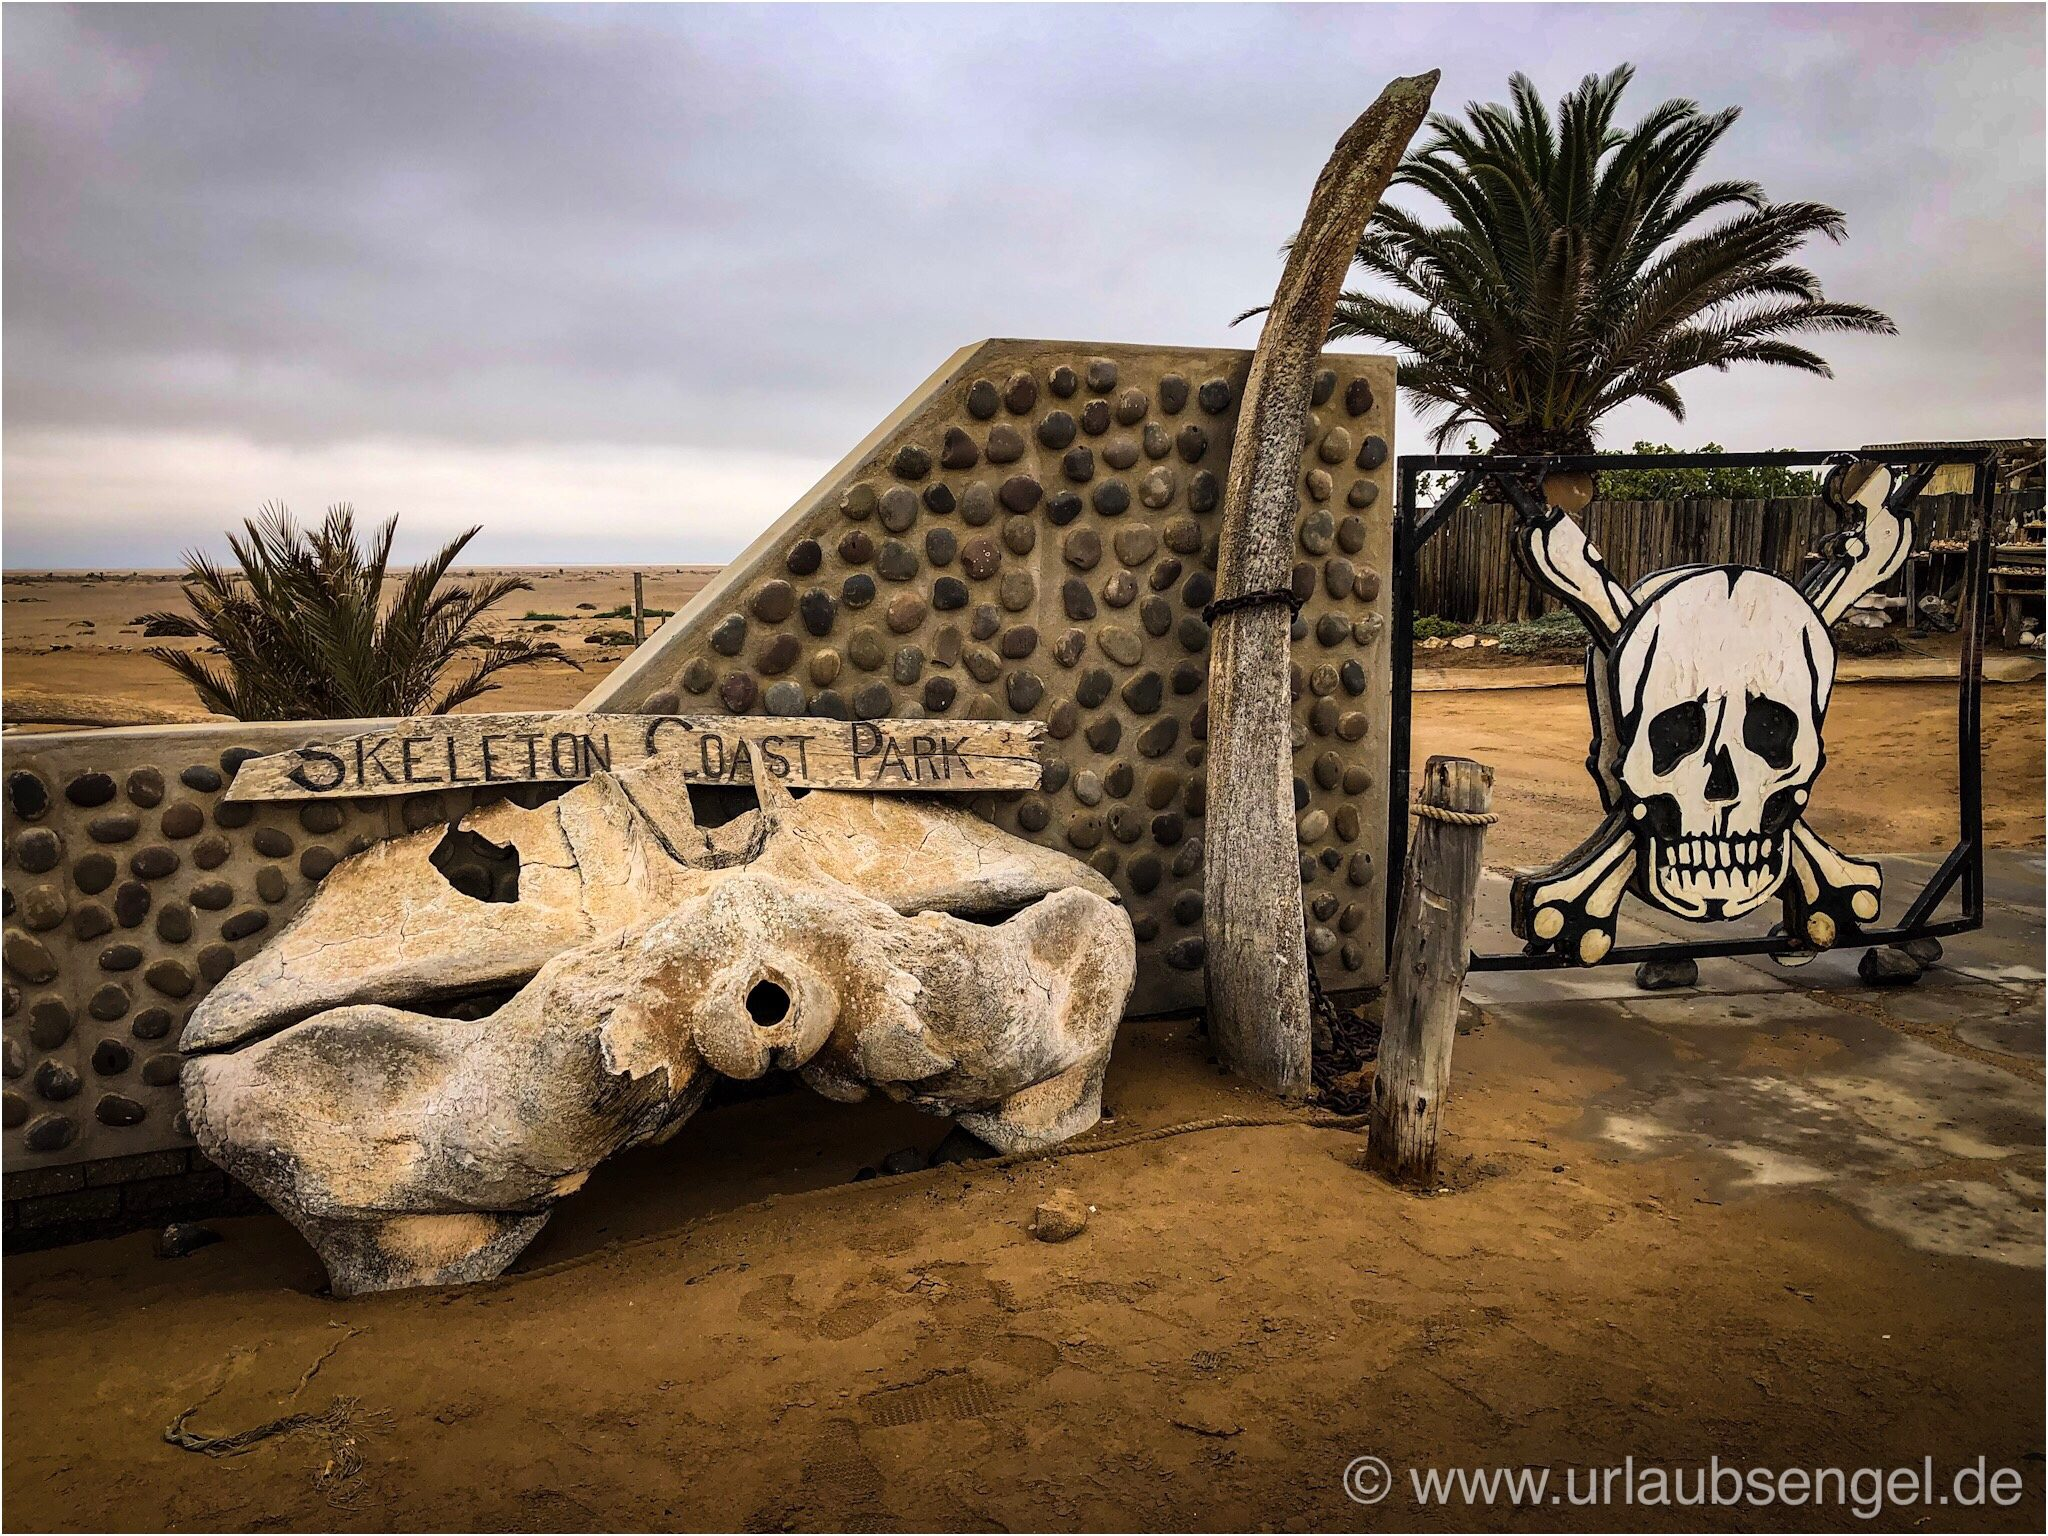 Eingang zur Skeletoncoast Namibia